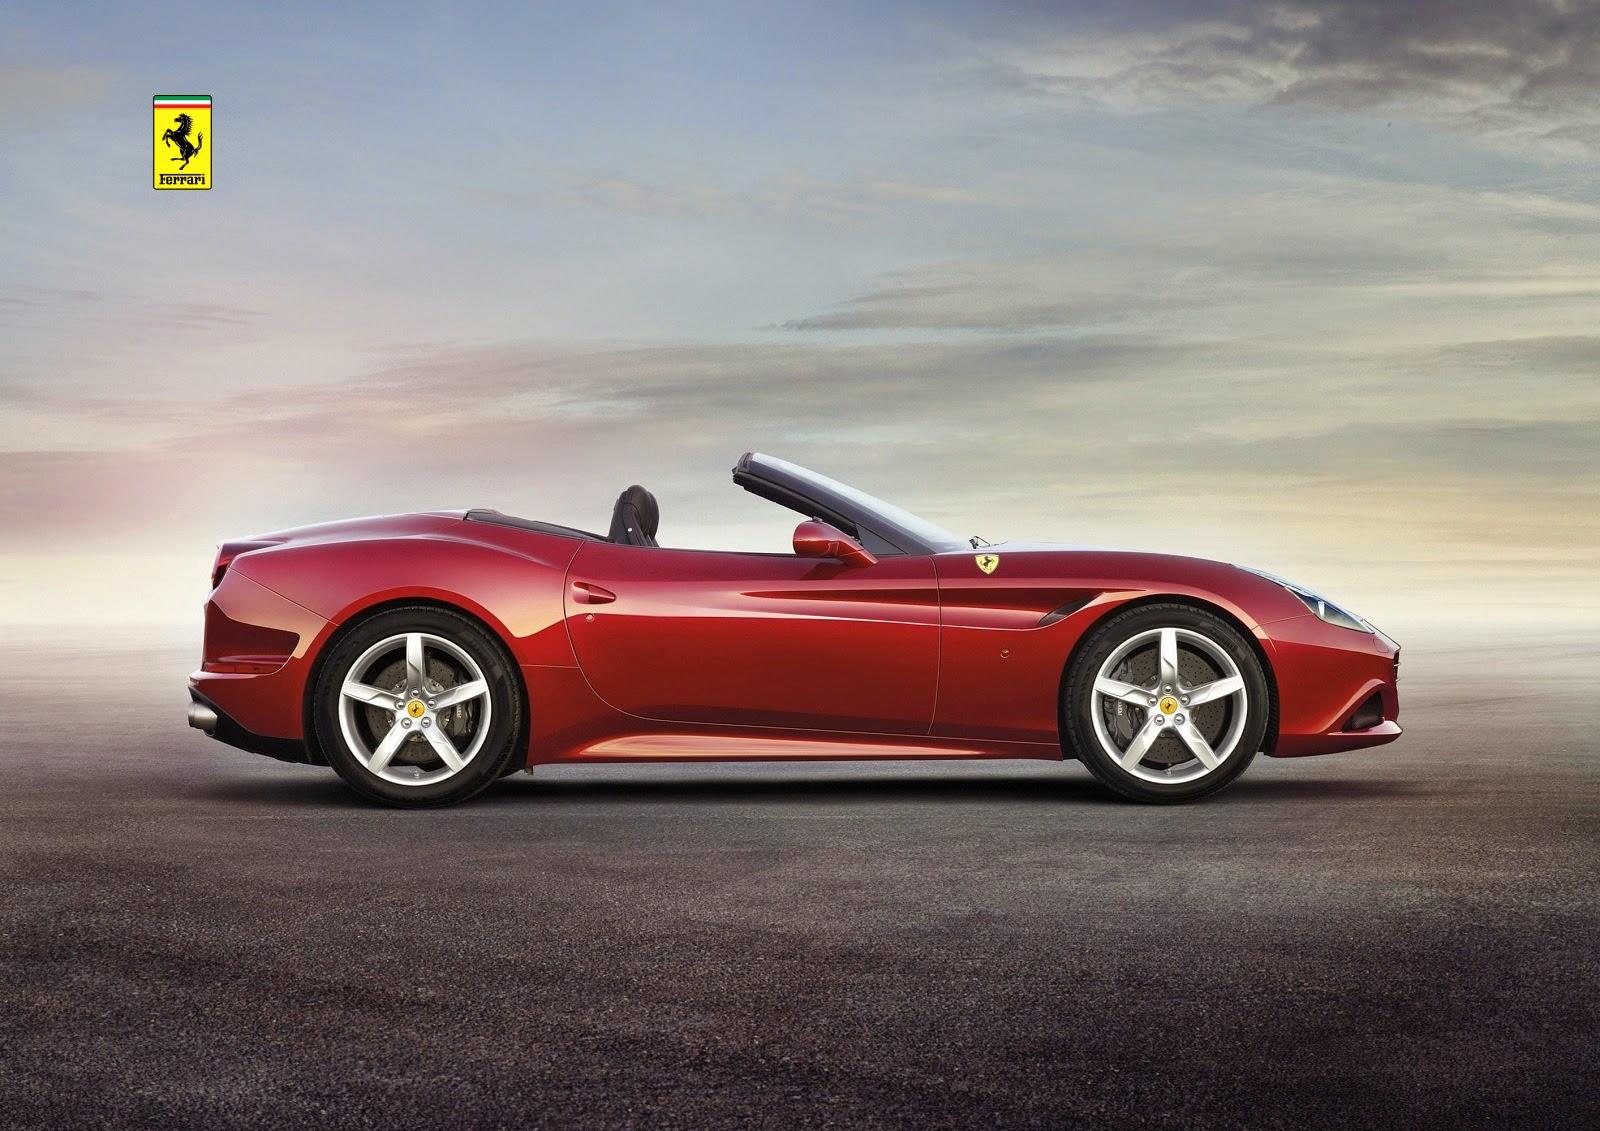 Model 2015 Ferrari California T  Twinturbo V8 560 Hp  Car